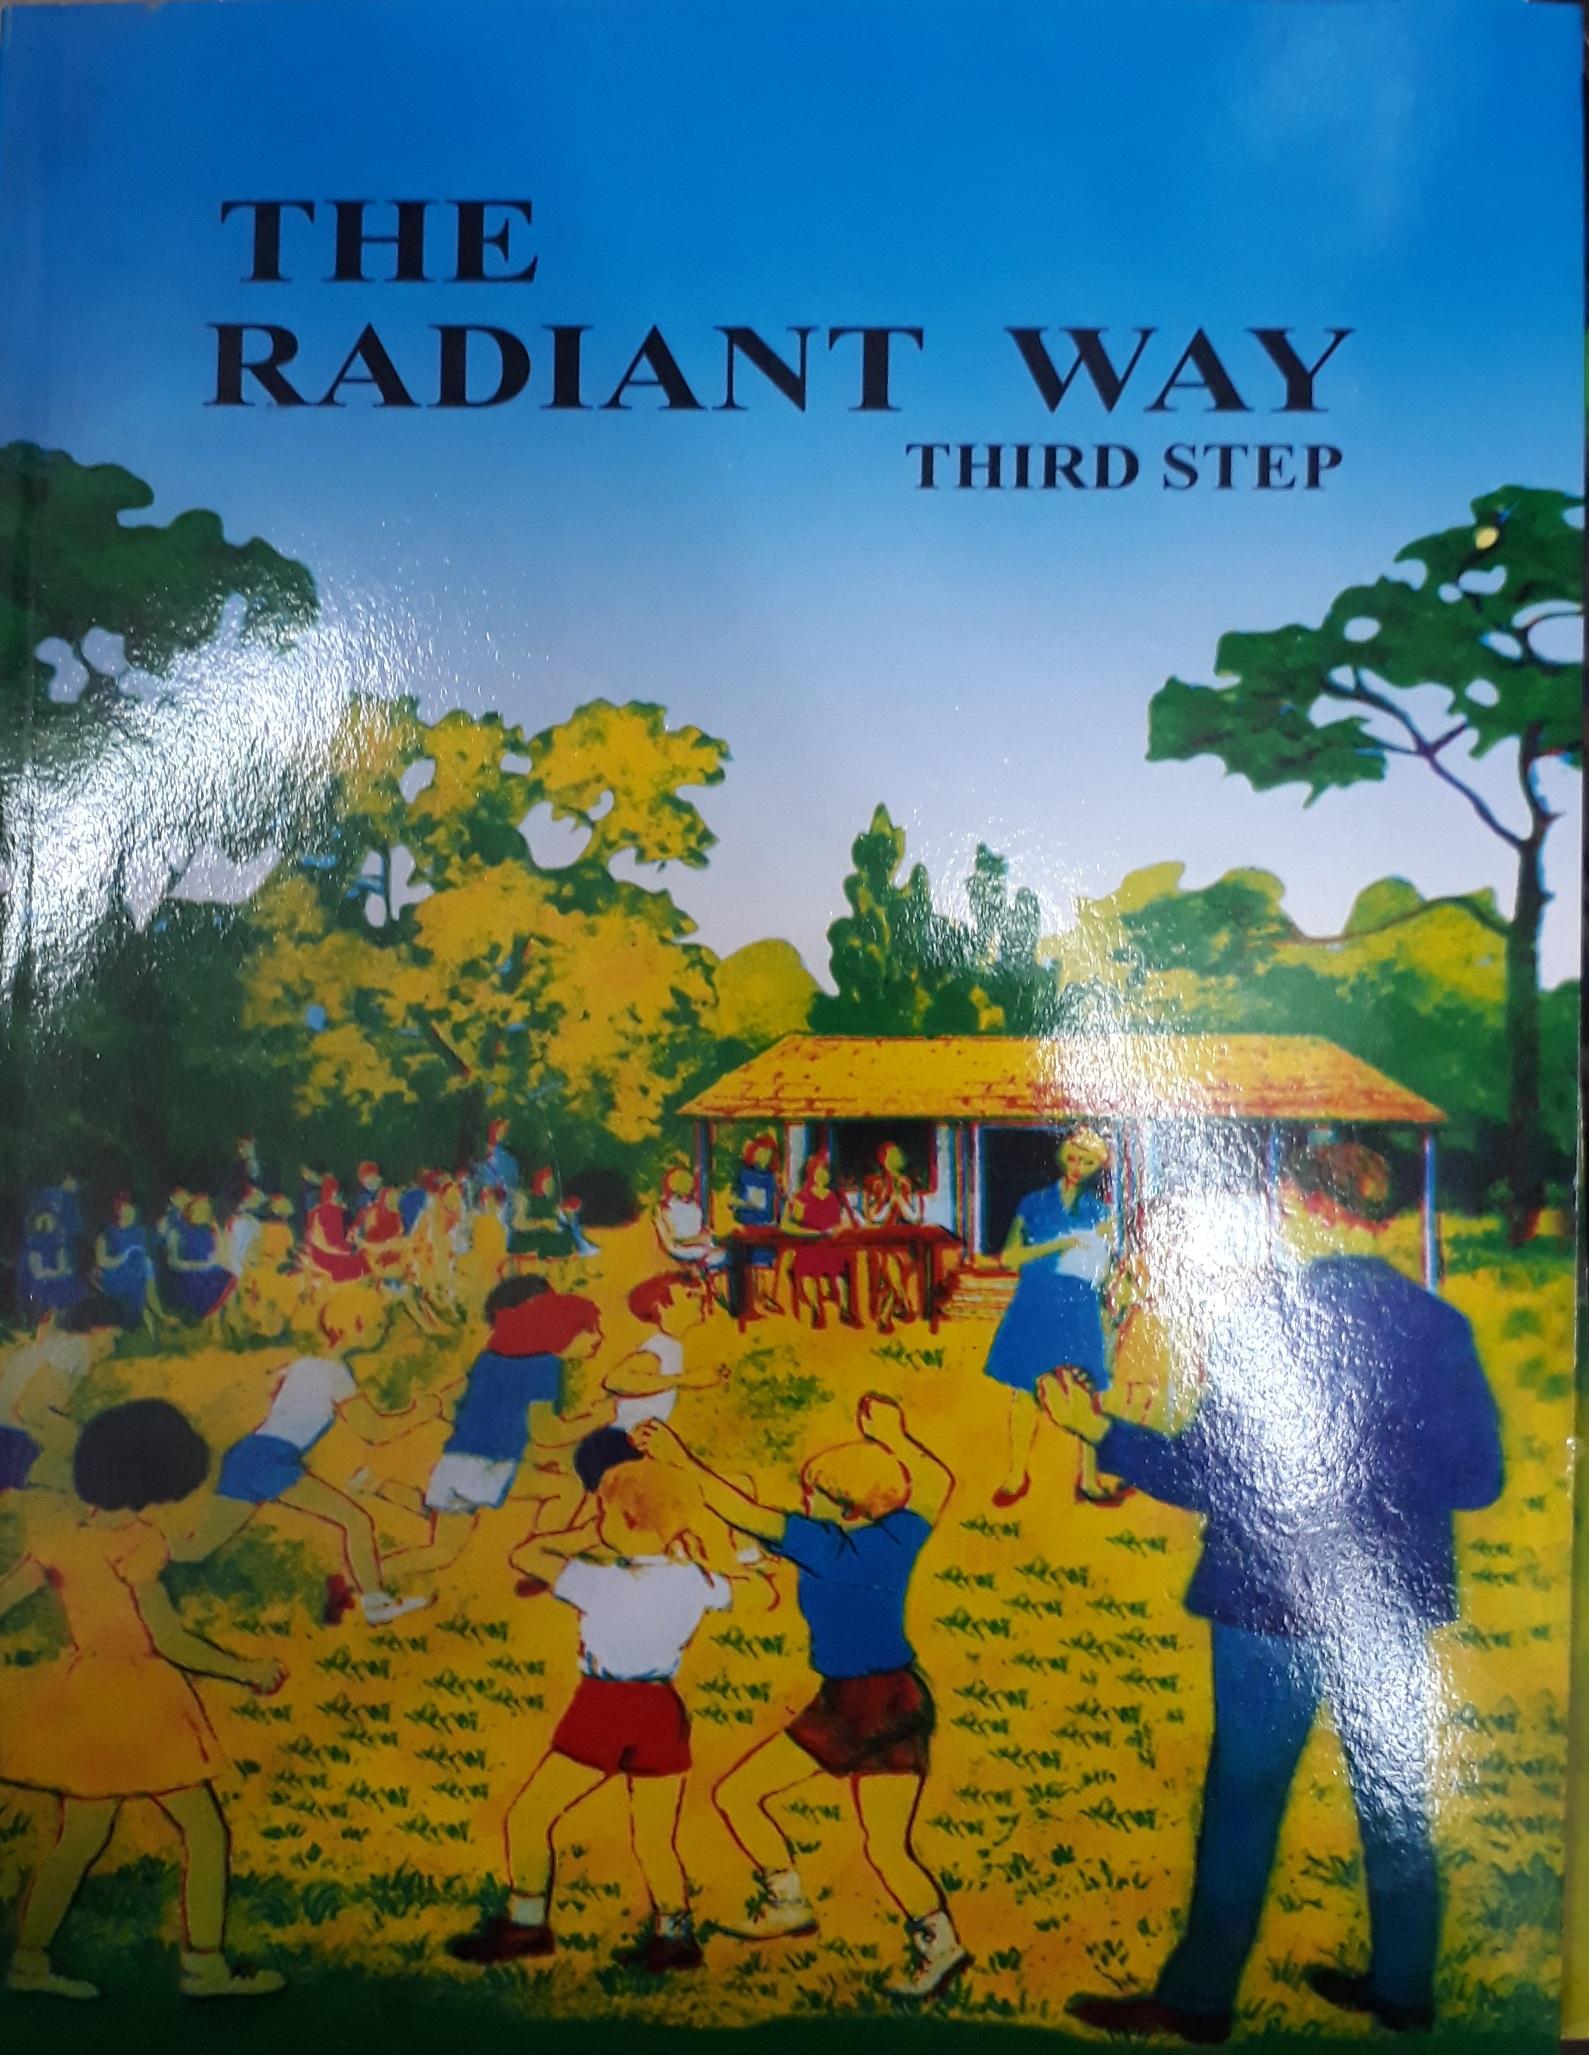 NEW RADIANT WAY THIRD STEP